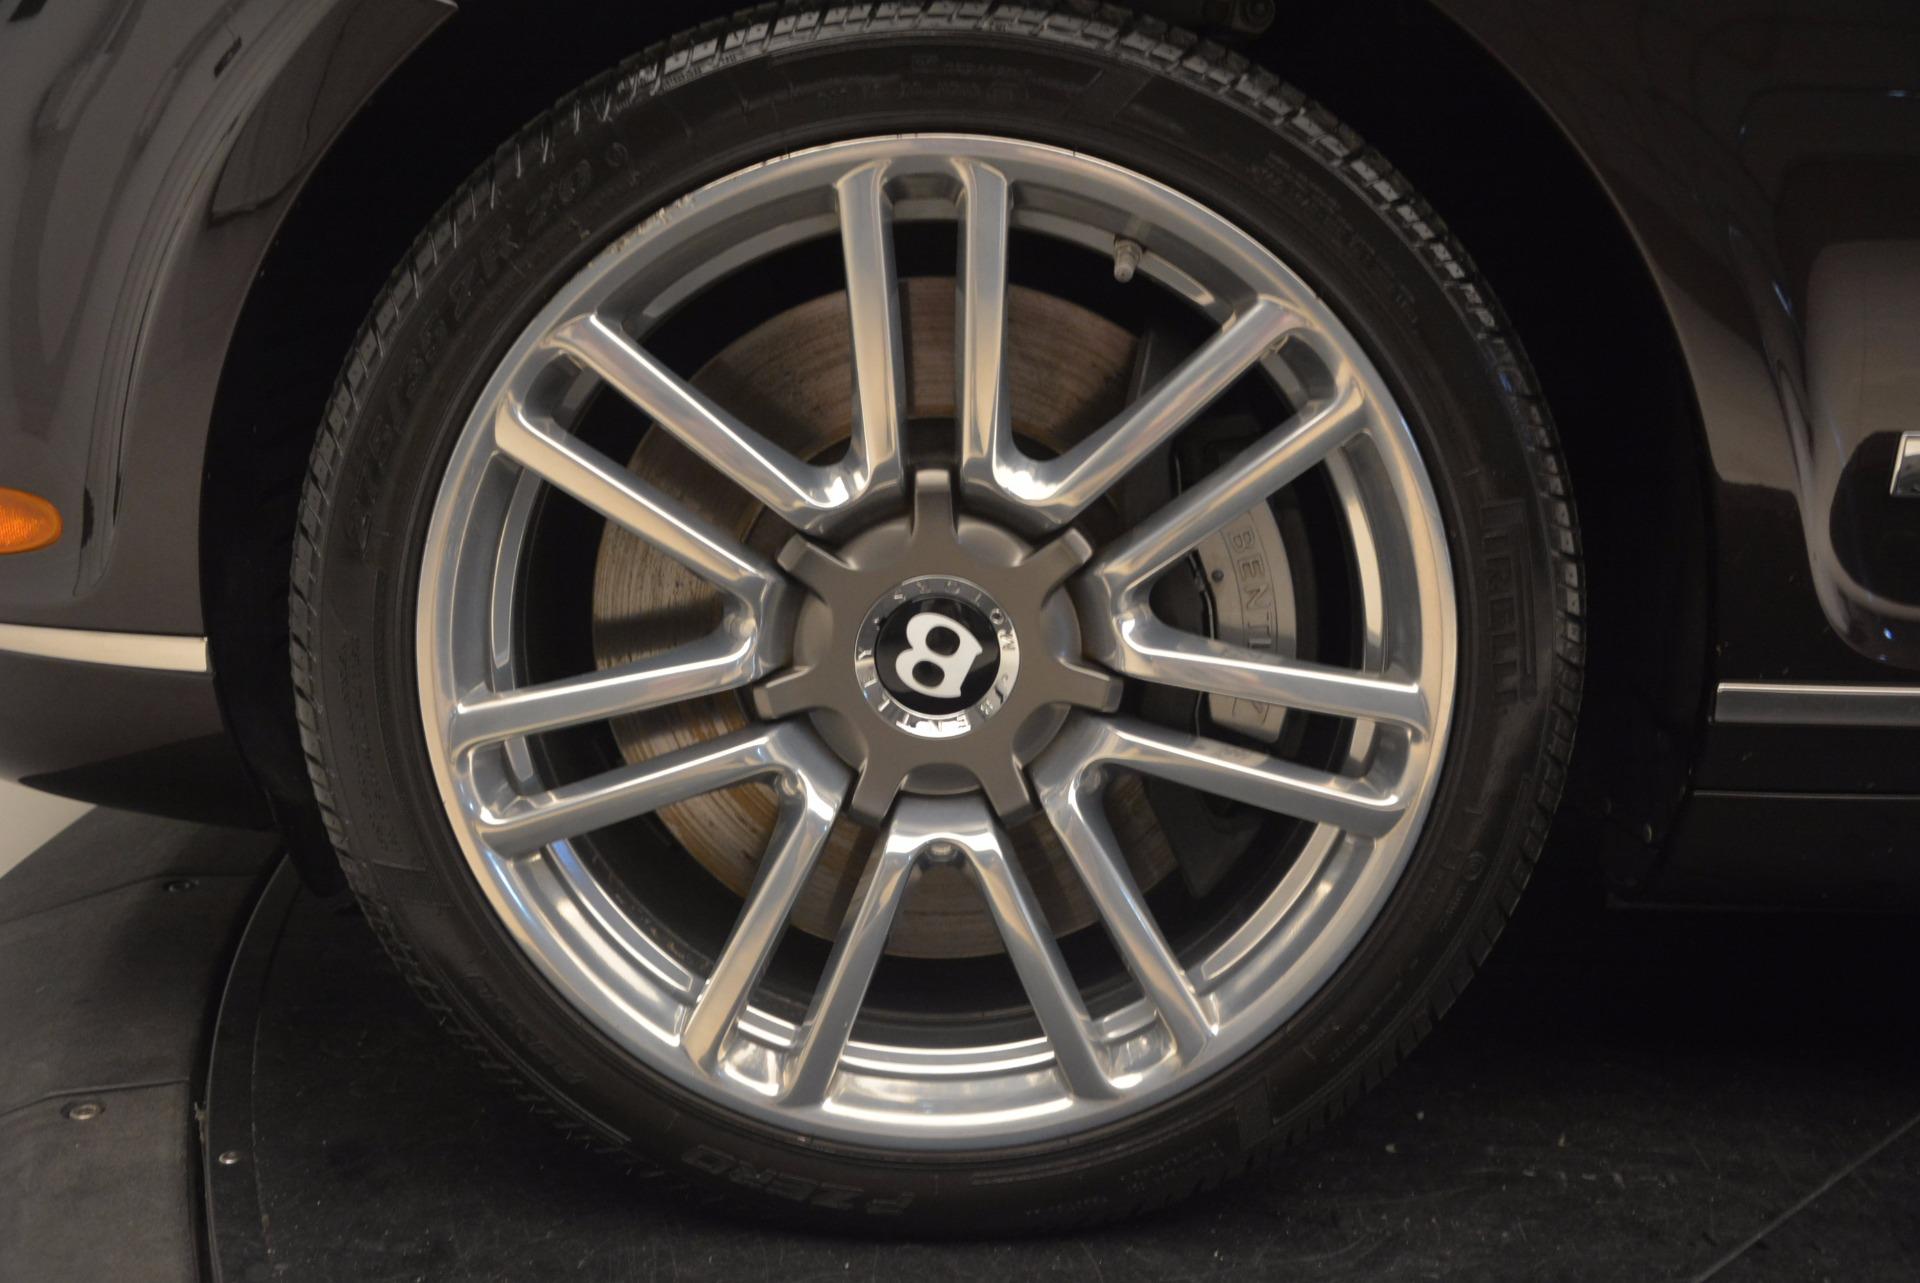 Used 2010 Bentley Continental GT Series 51 For Sale In Westport, CT 1222_p29